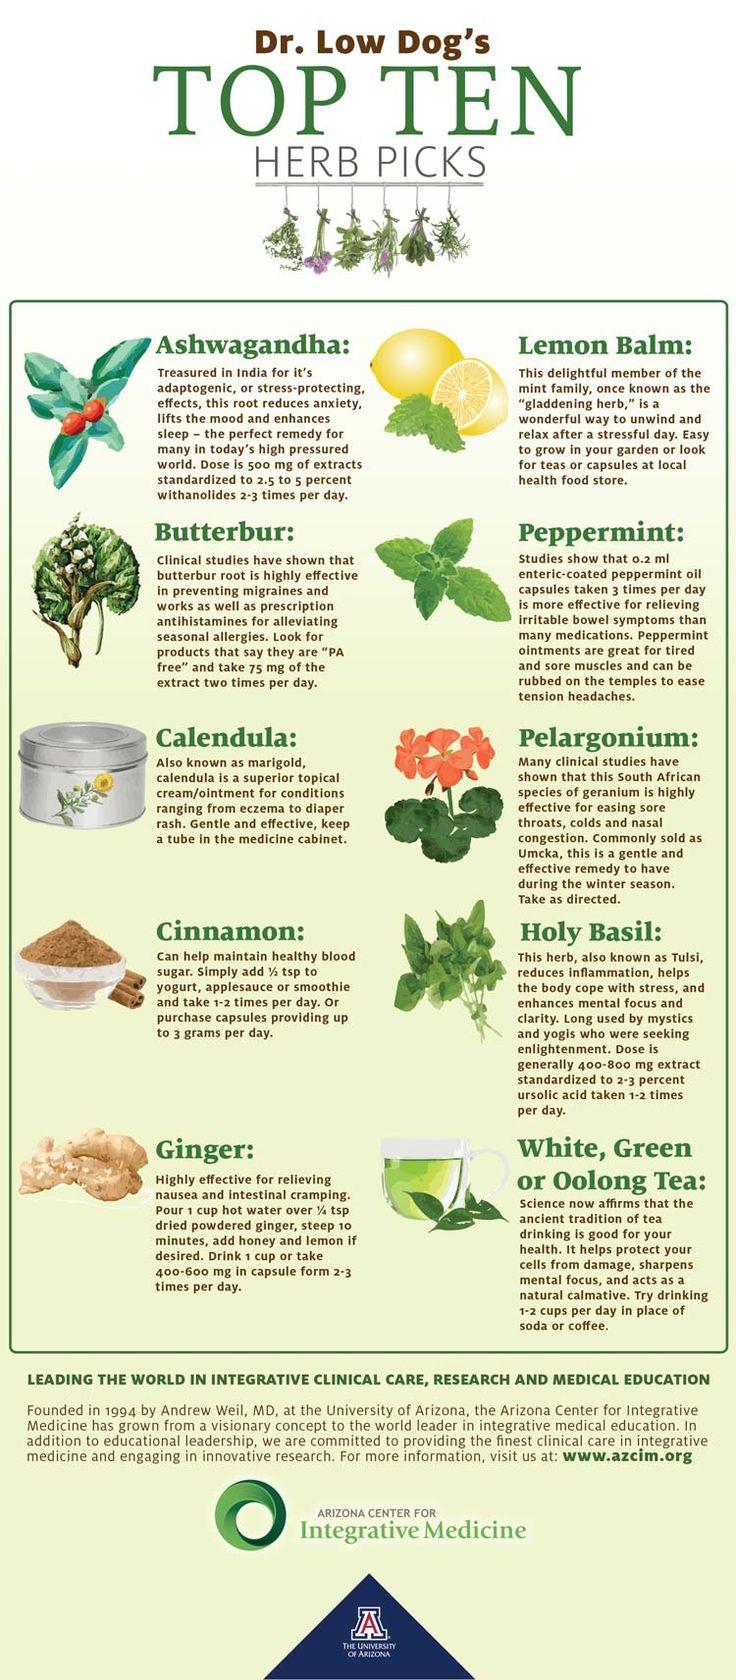 From the University of Arizona Center for Integrative Medicine (AzCIM.org) Dr. Tieraona Low Dog's - Top Ten Herb Picks #integrative #herbs @lowdogmd